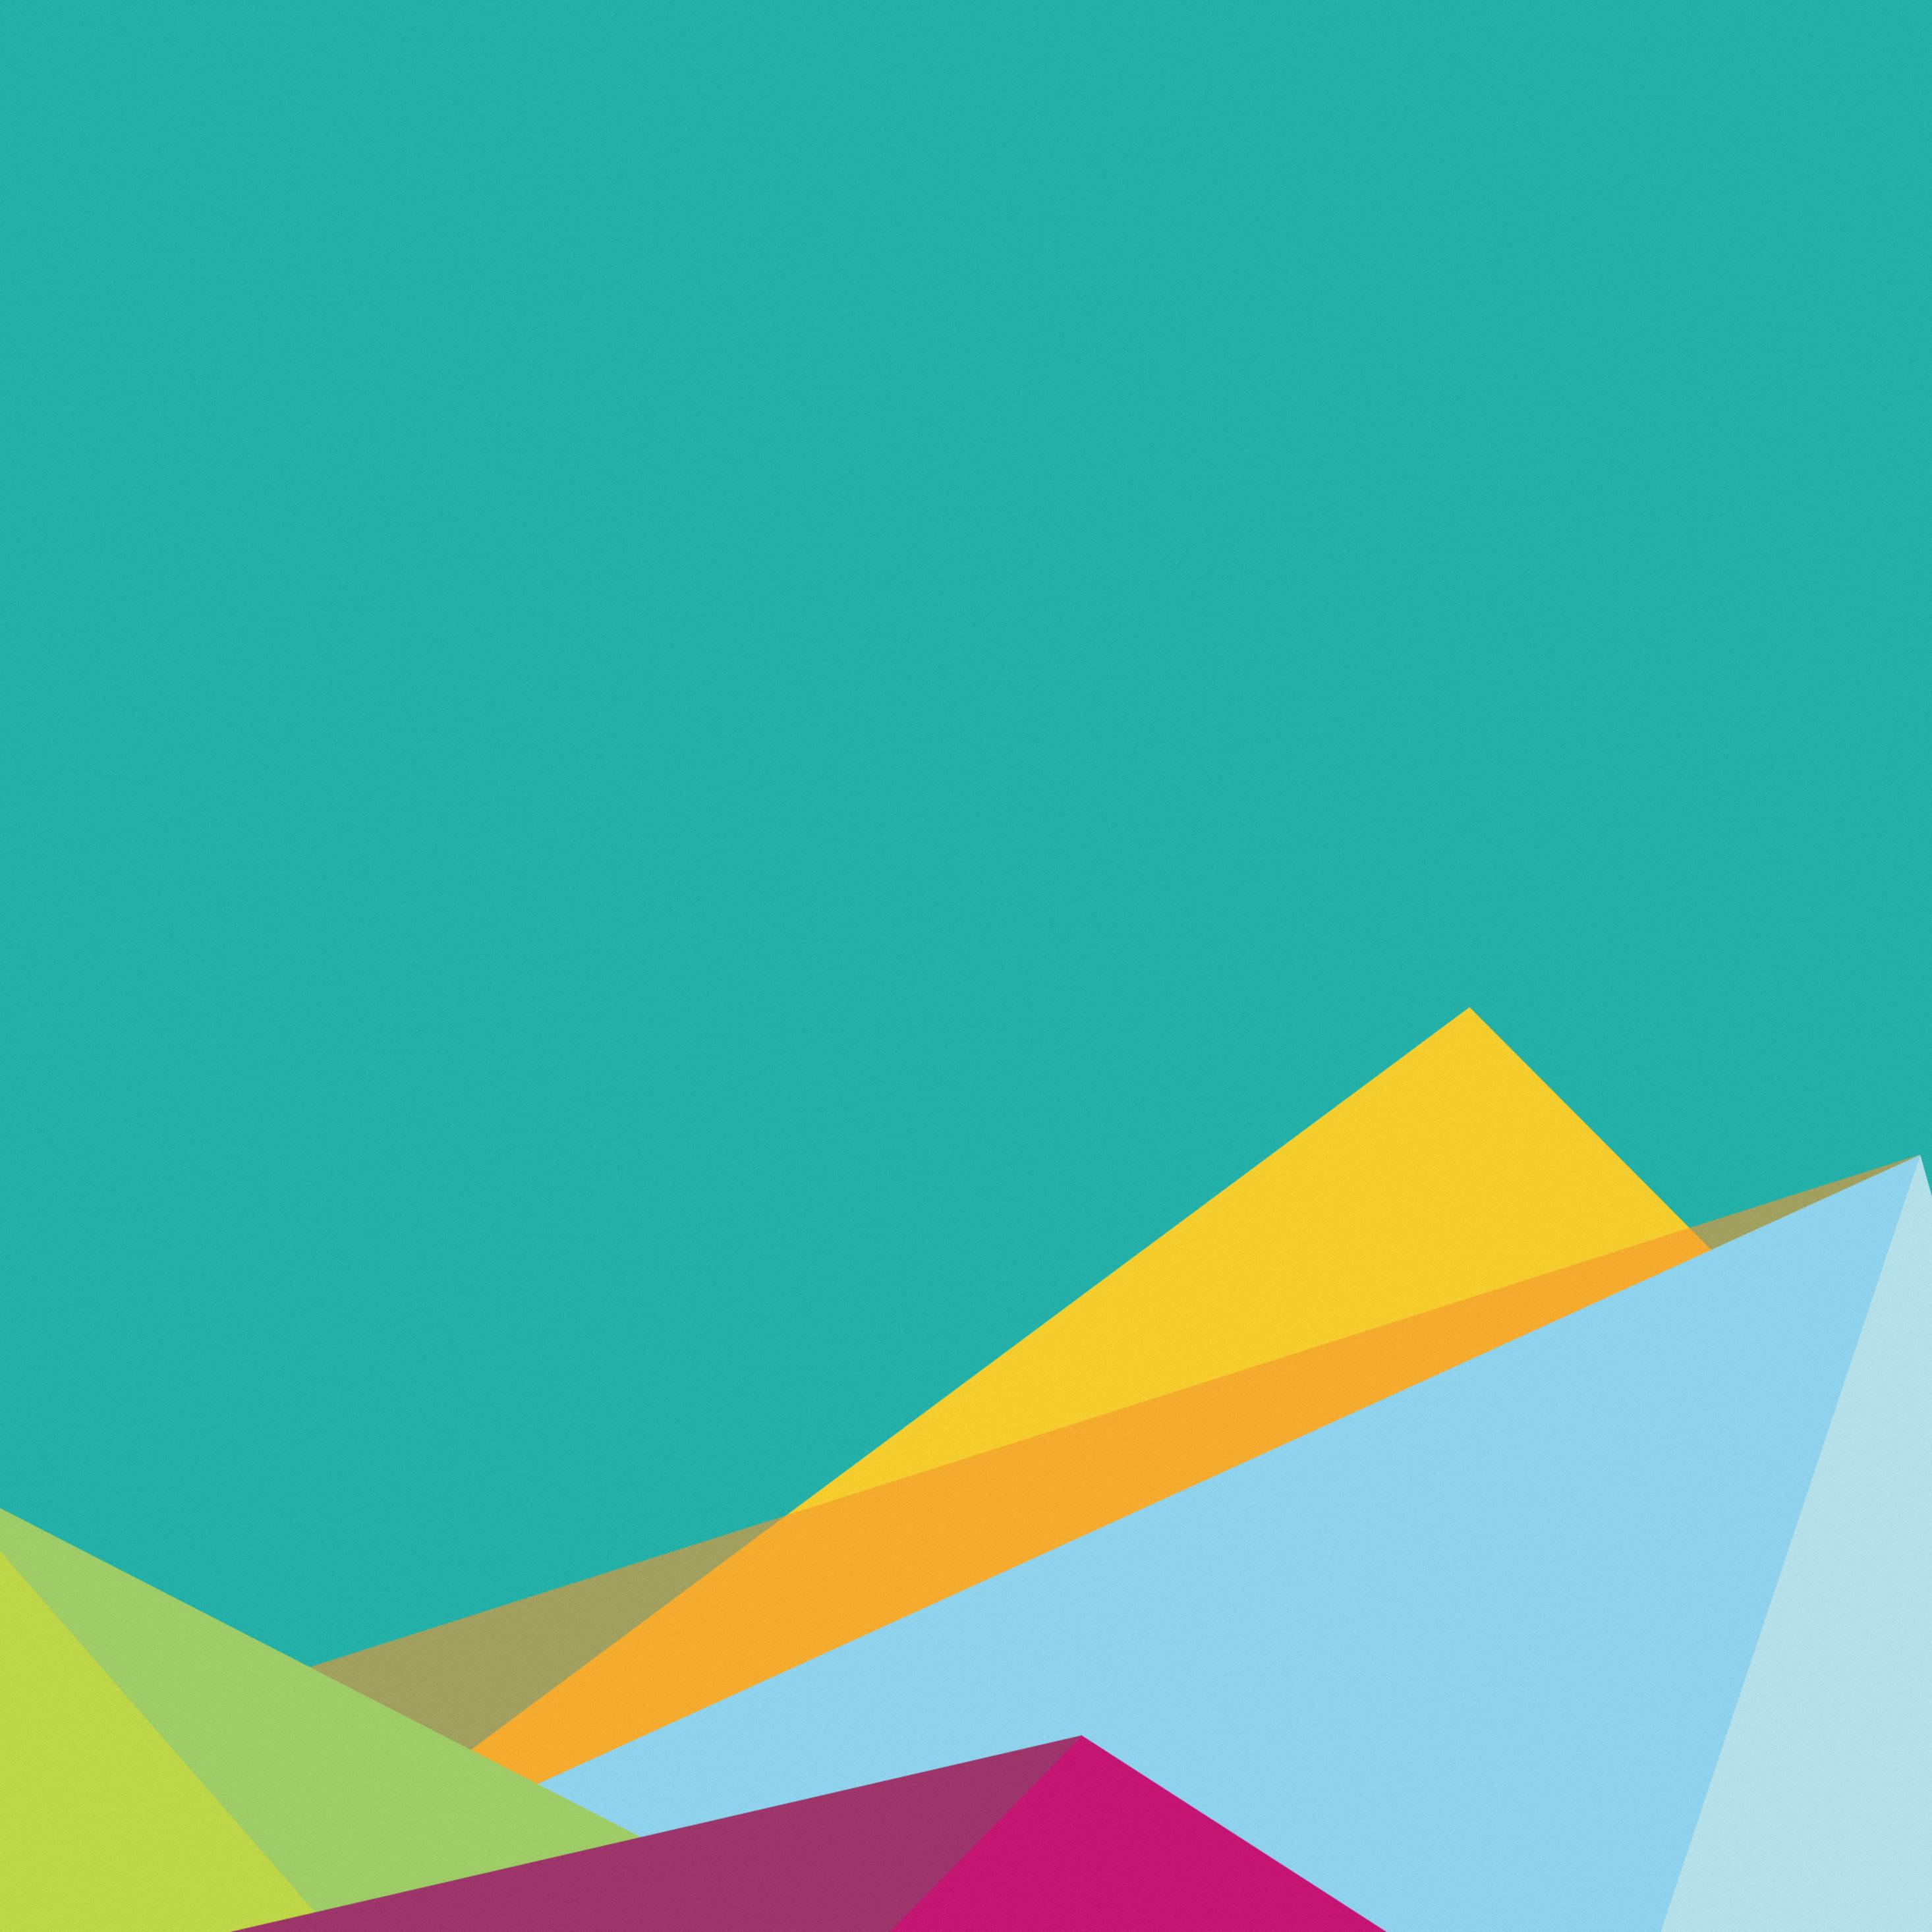 crystal-mountains-minimalism-3d-hj.jpg